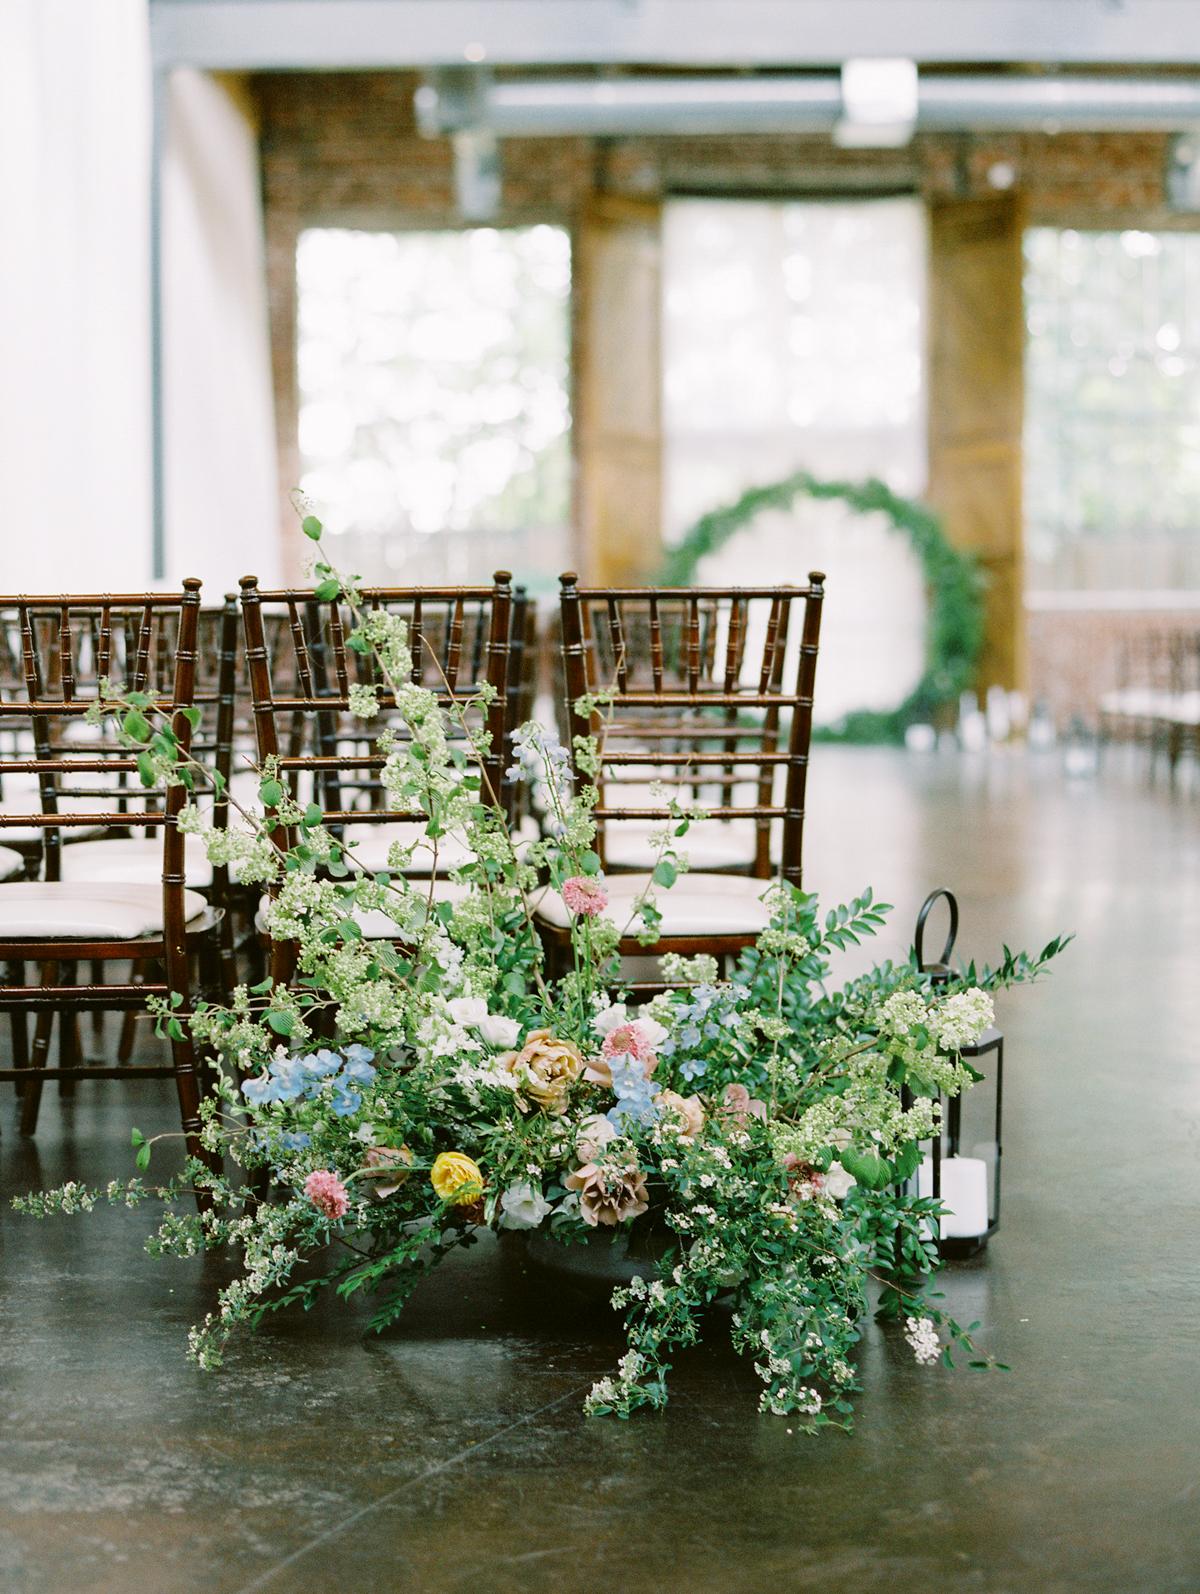 Foundry-At-Puritan-Mill-wedding-photos-venue-atlanta-fine-art-film-photographer31.JPG